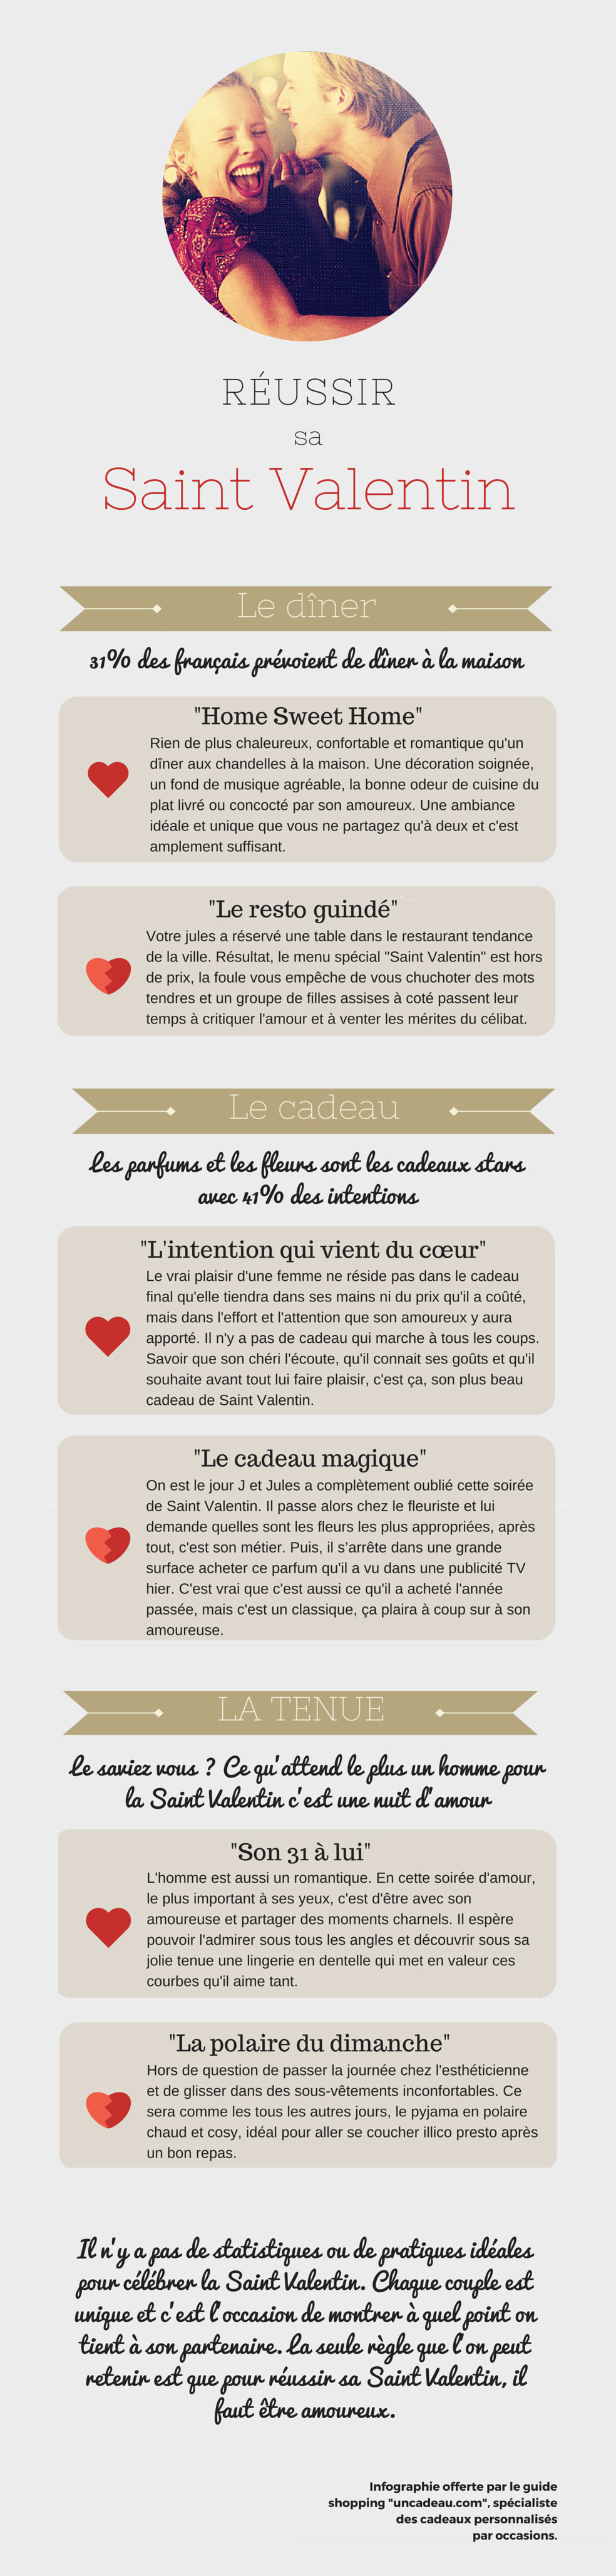 Infographie-Saint-Valentin